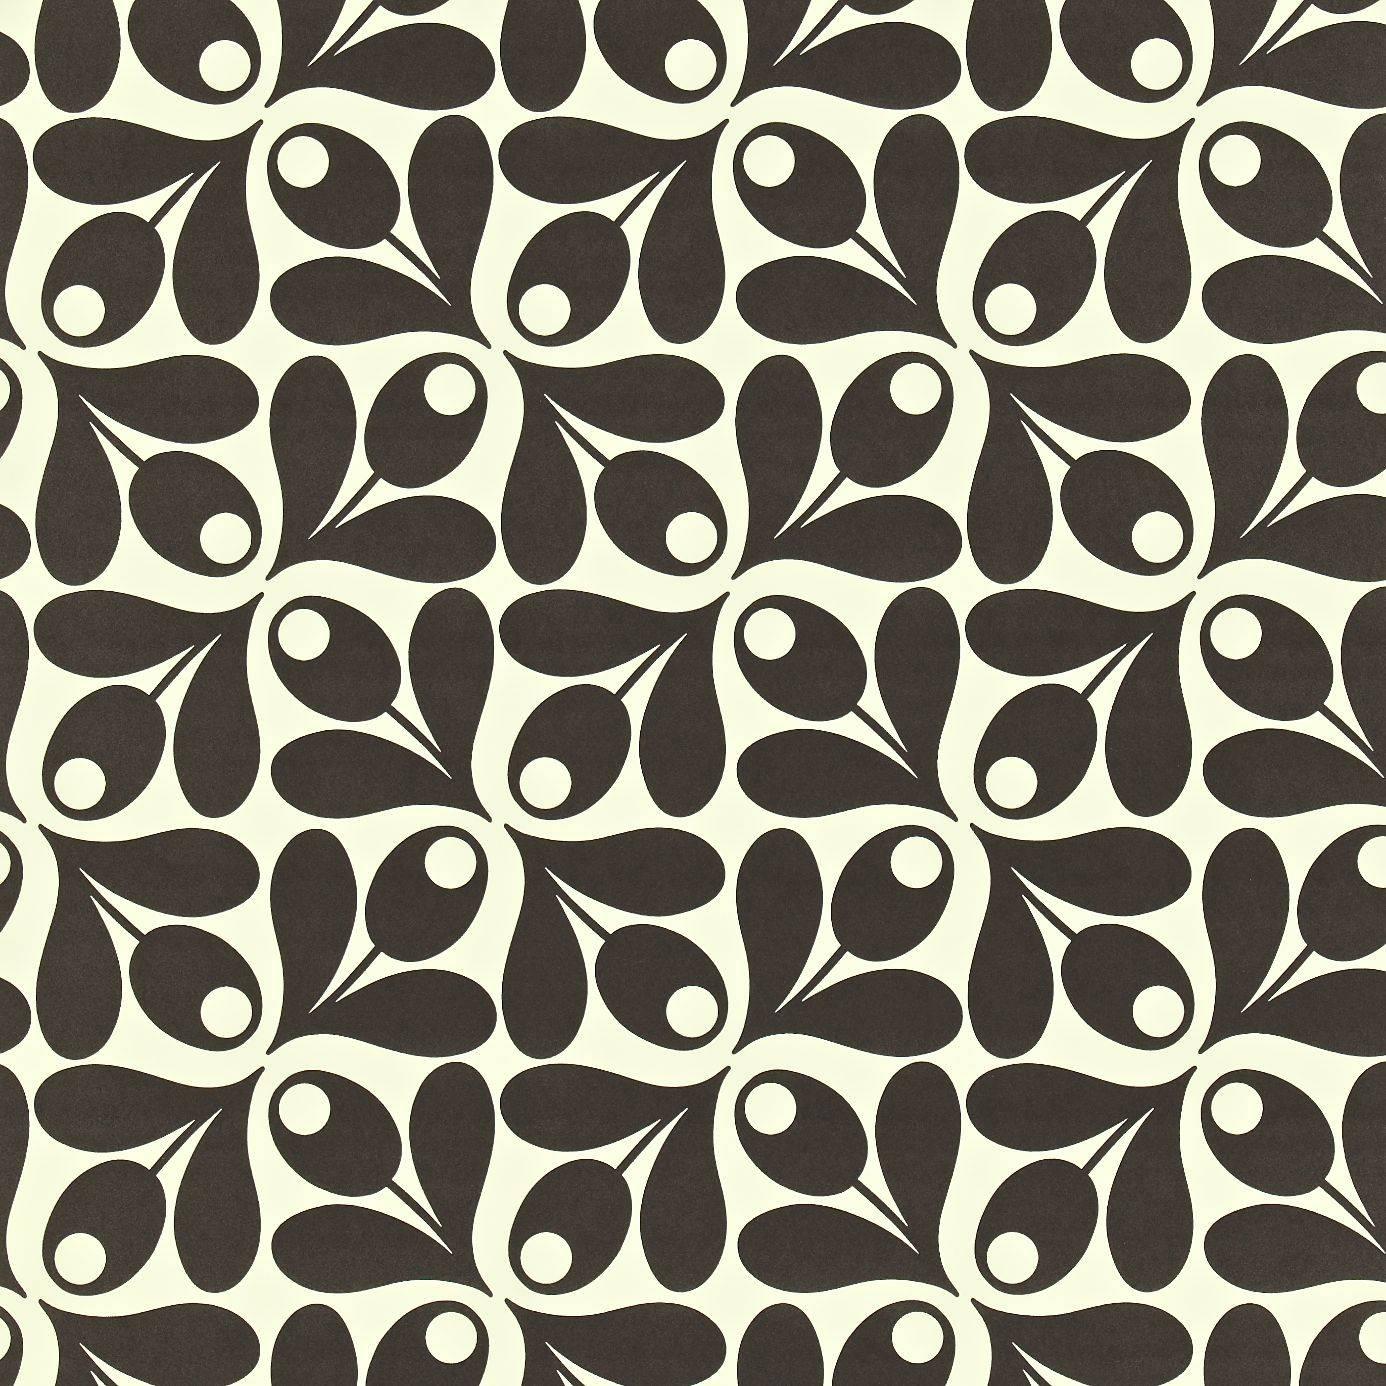 Harlequin Small Acorn Cup Wallpaper Ebonyproduct Code 110415